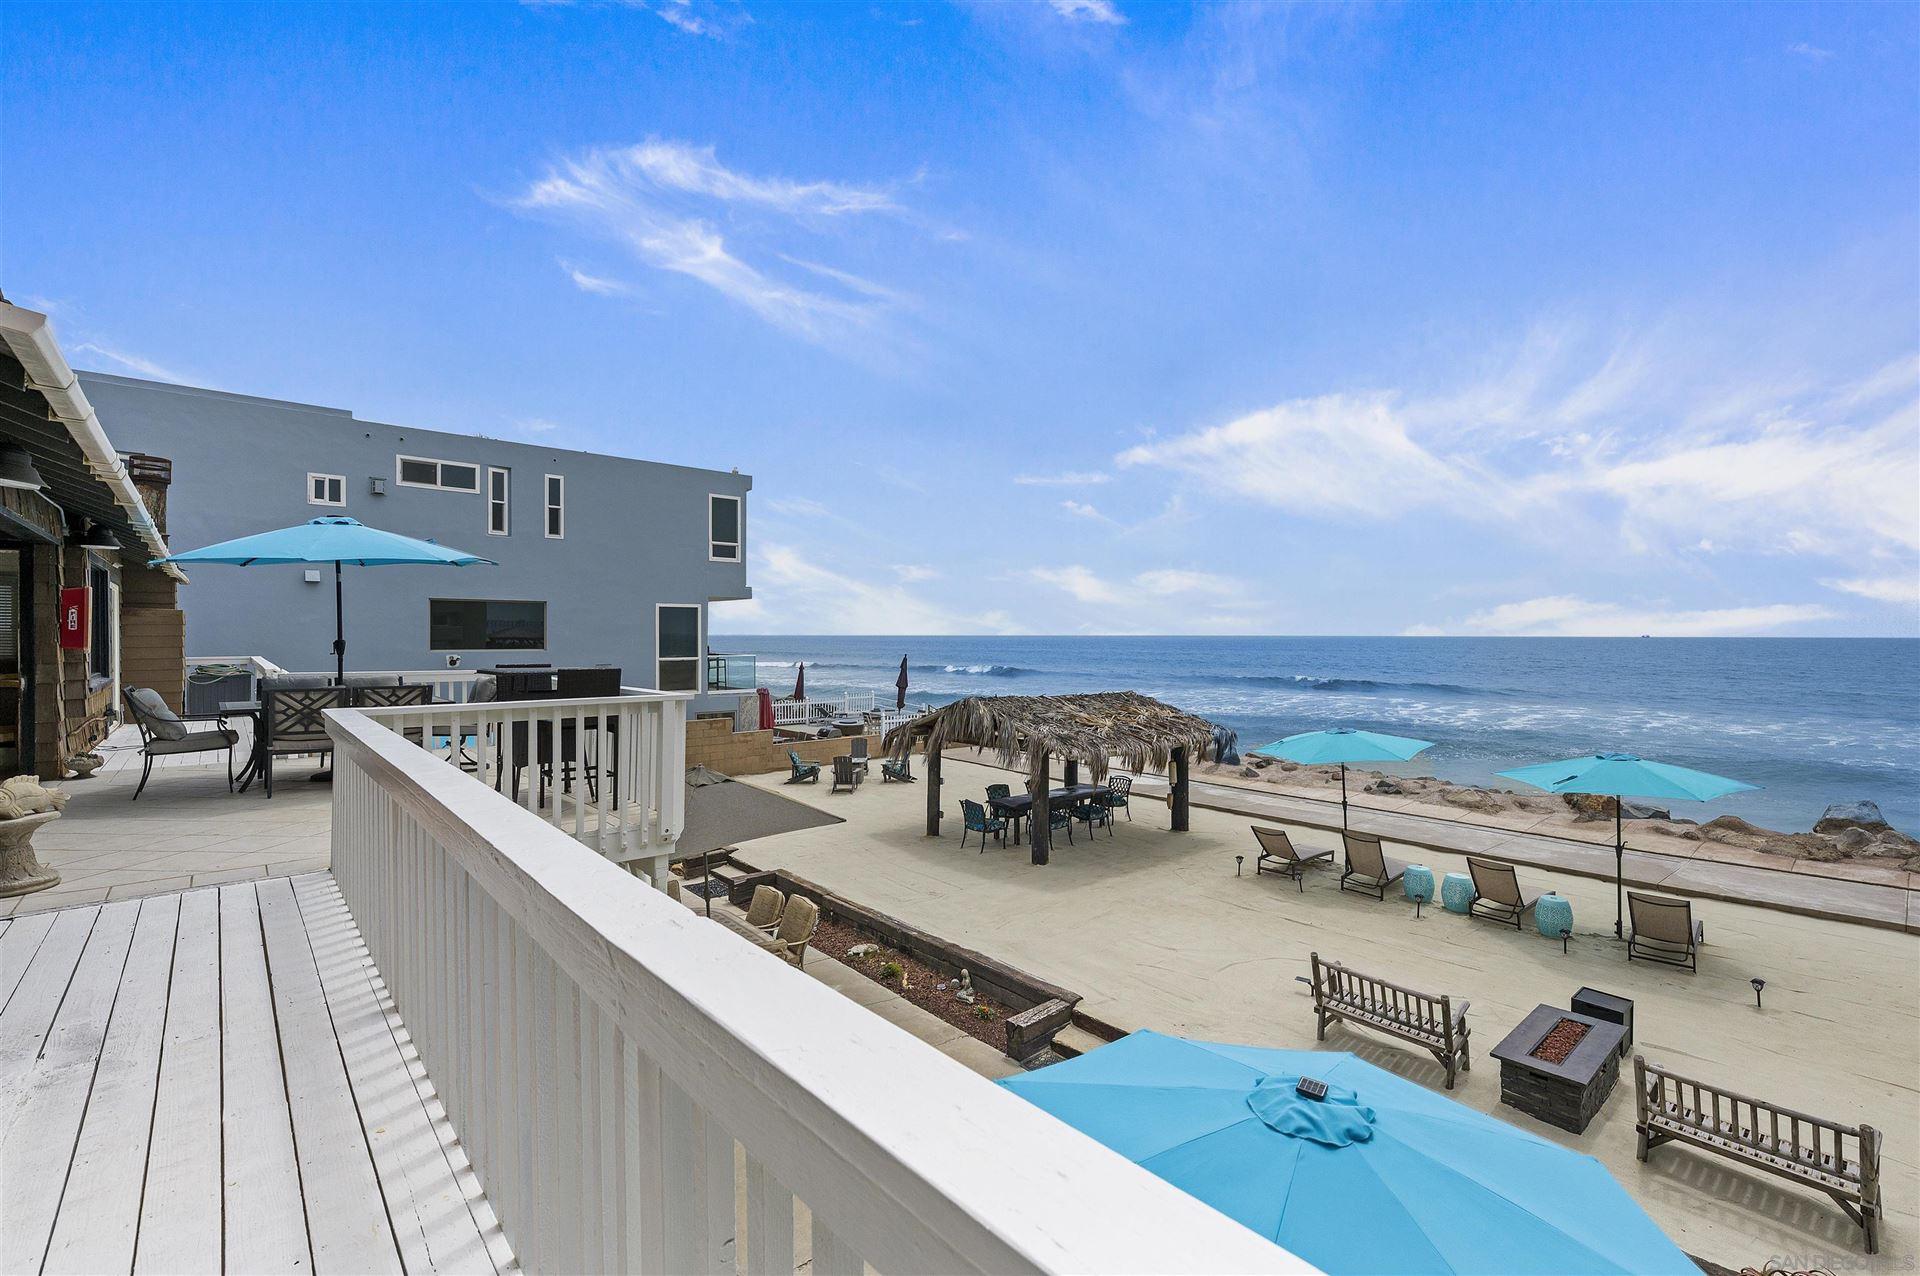 Photo of 925 S pacific st, Oceanside, CA 92054 (MLS # 210025693)